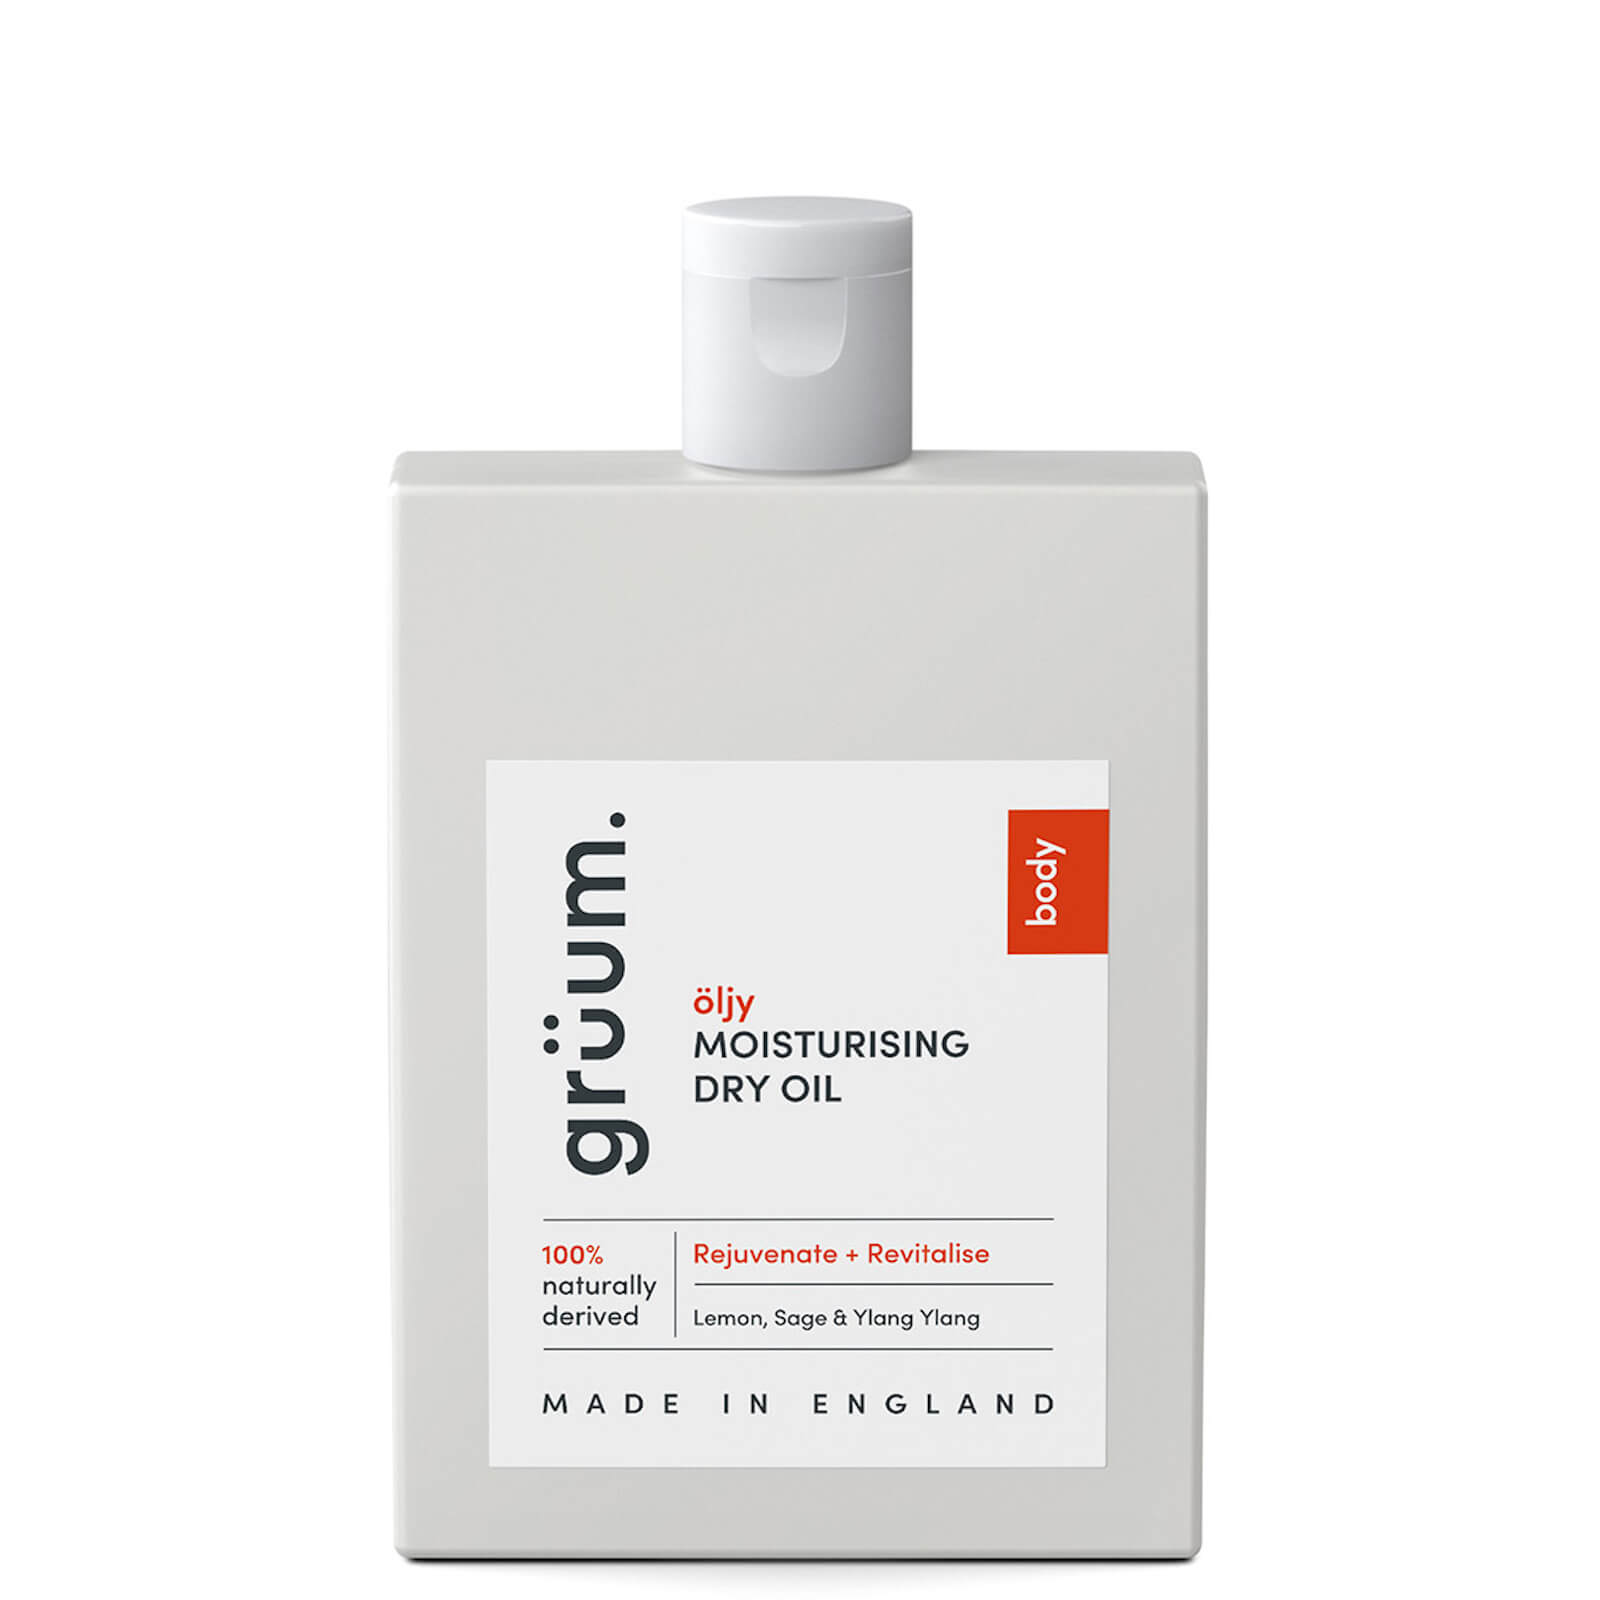 grüum Öljy Moisturising Dry Oil - Rejuvenate and Revitalise 100ml